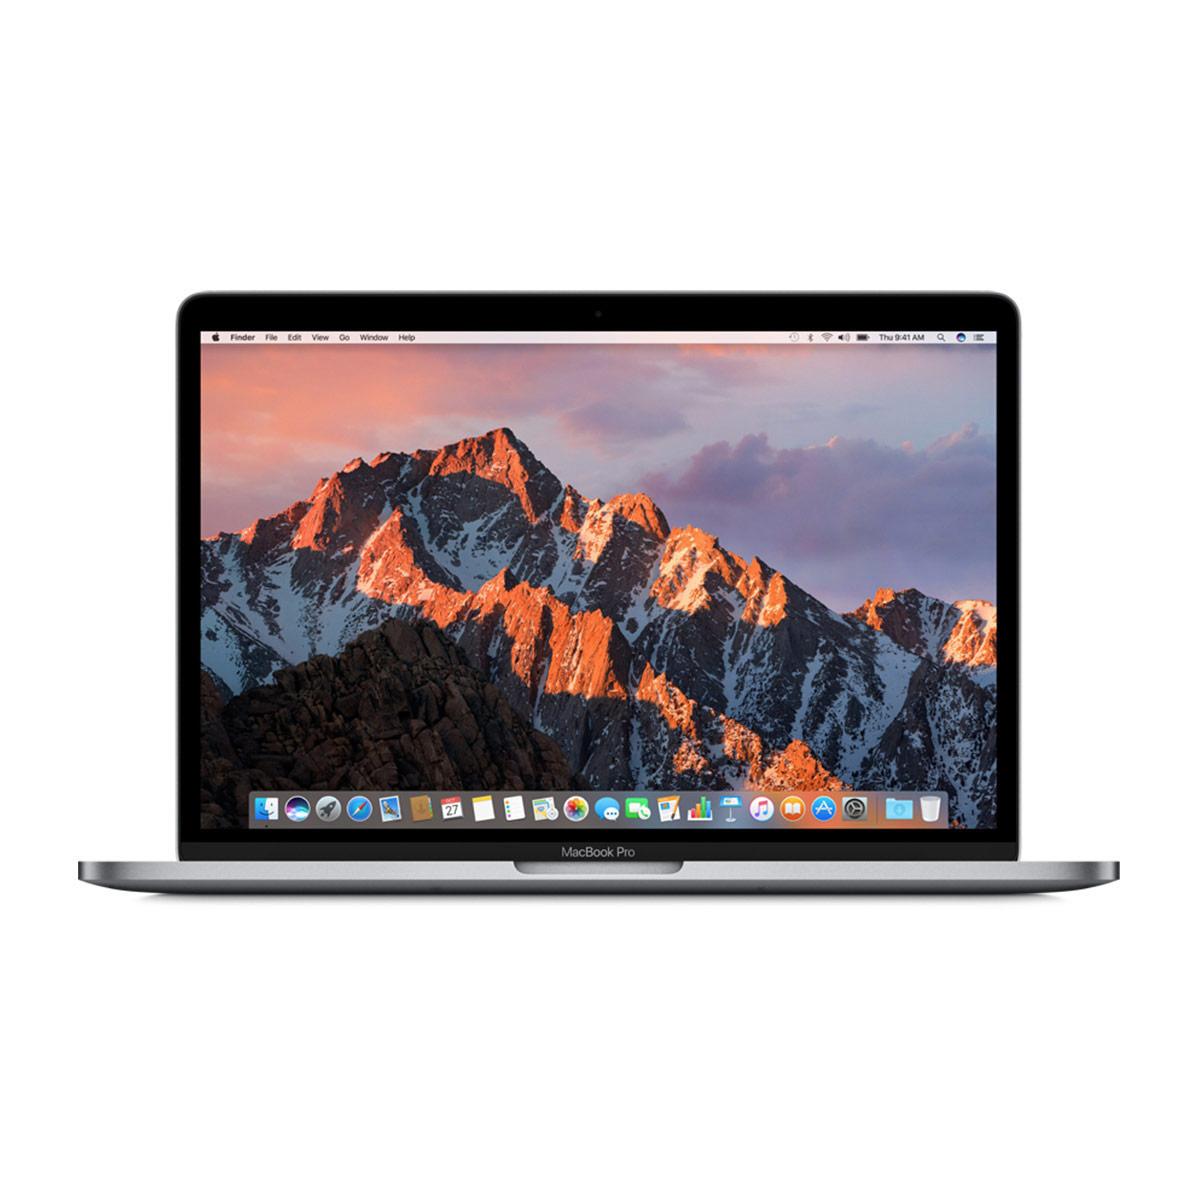 "MacBook Pro 13"" TouchBar Quad i7 2.7GHz 16GB 1TB Iris 655 Space Grey"